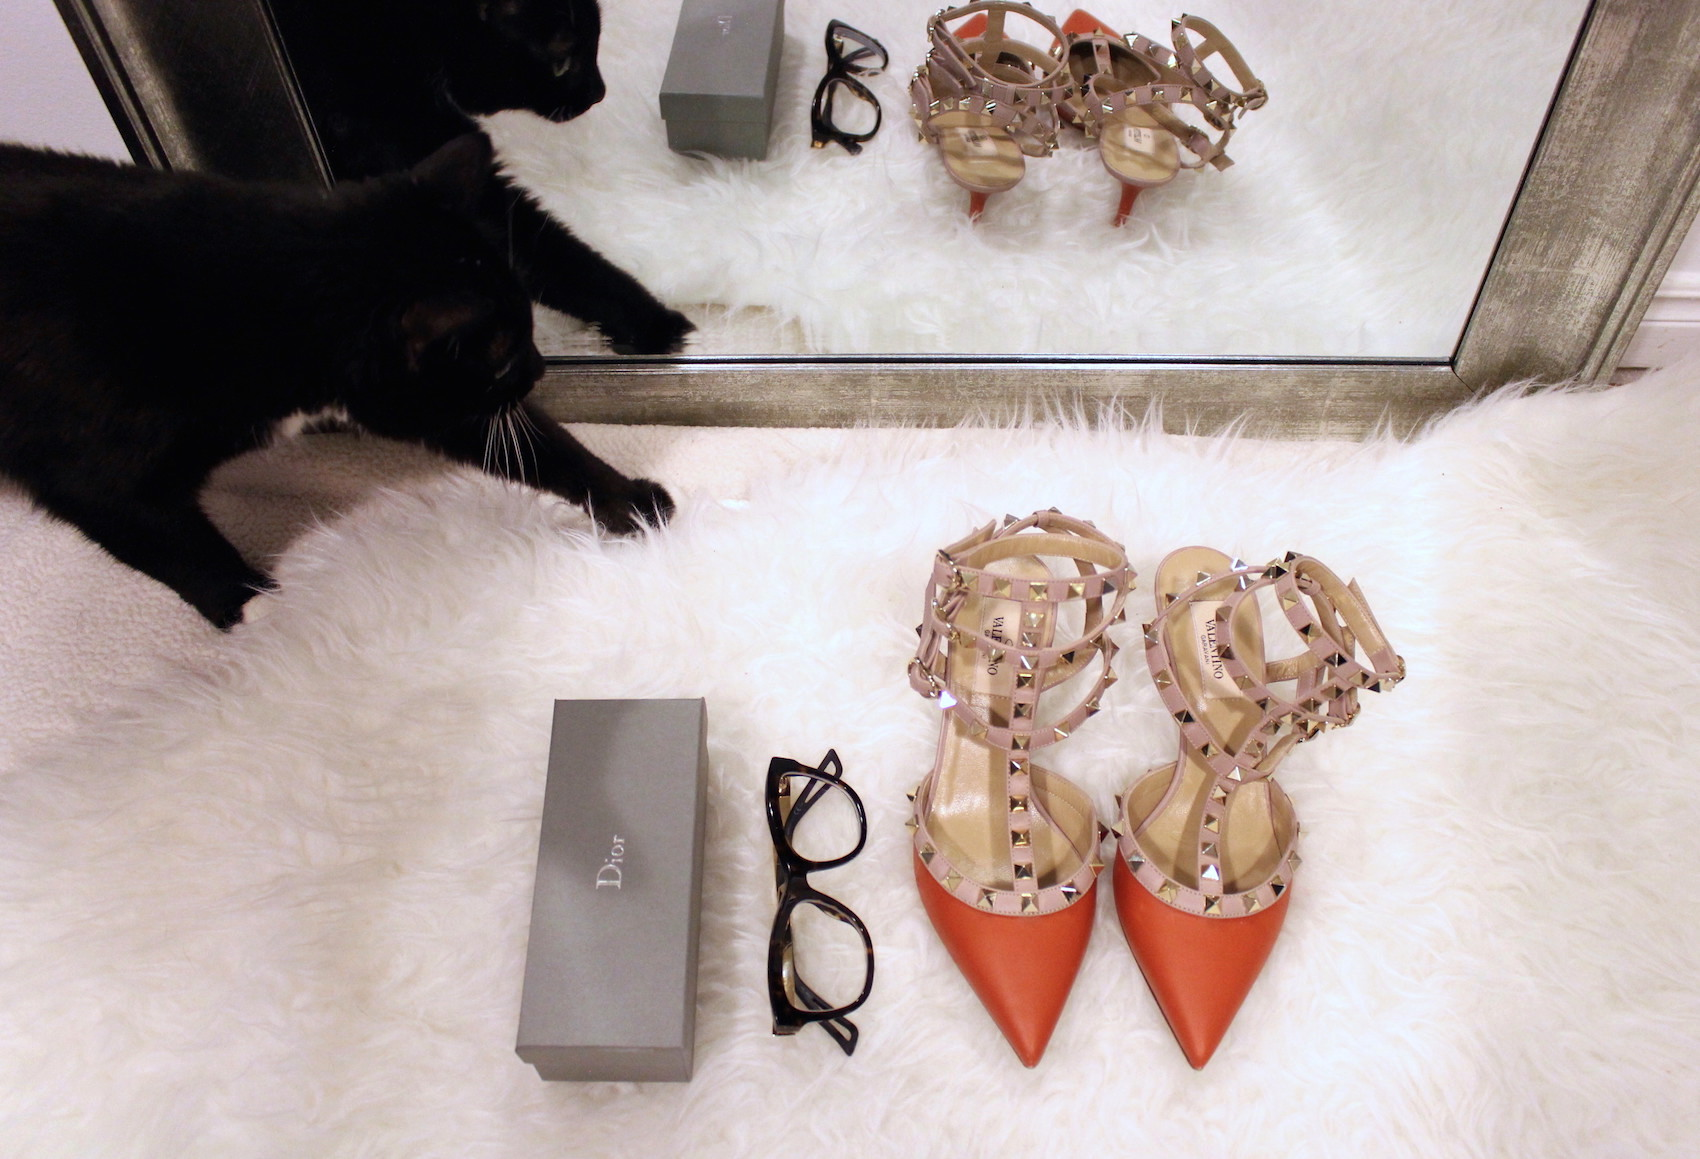 WoahStyle.com | Dior glasses, orange Valentino rockstuds, Tom Ford lipstick in Wild Ginger